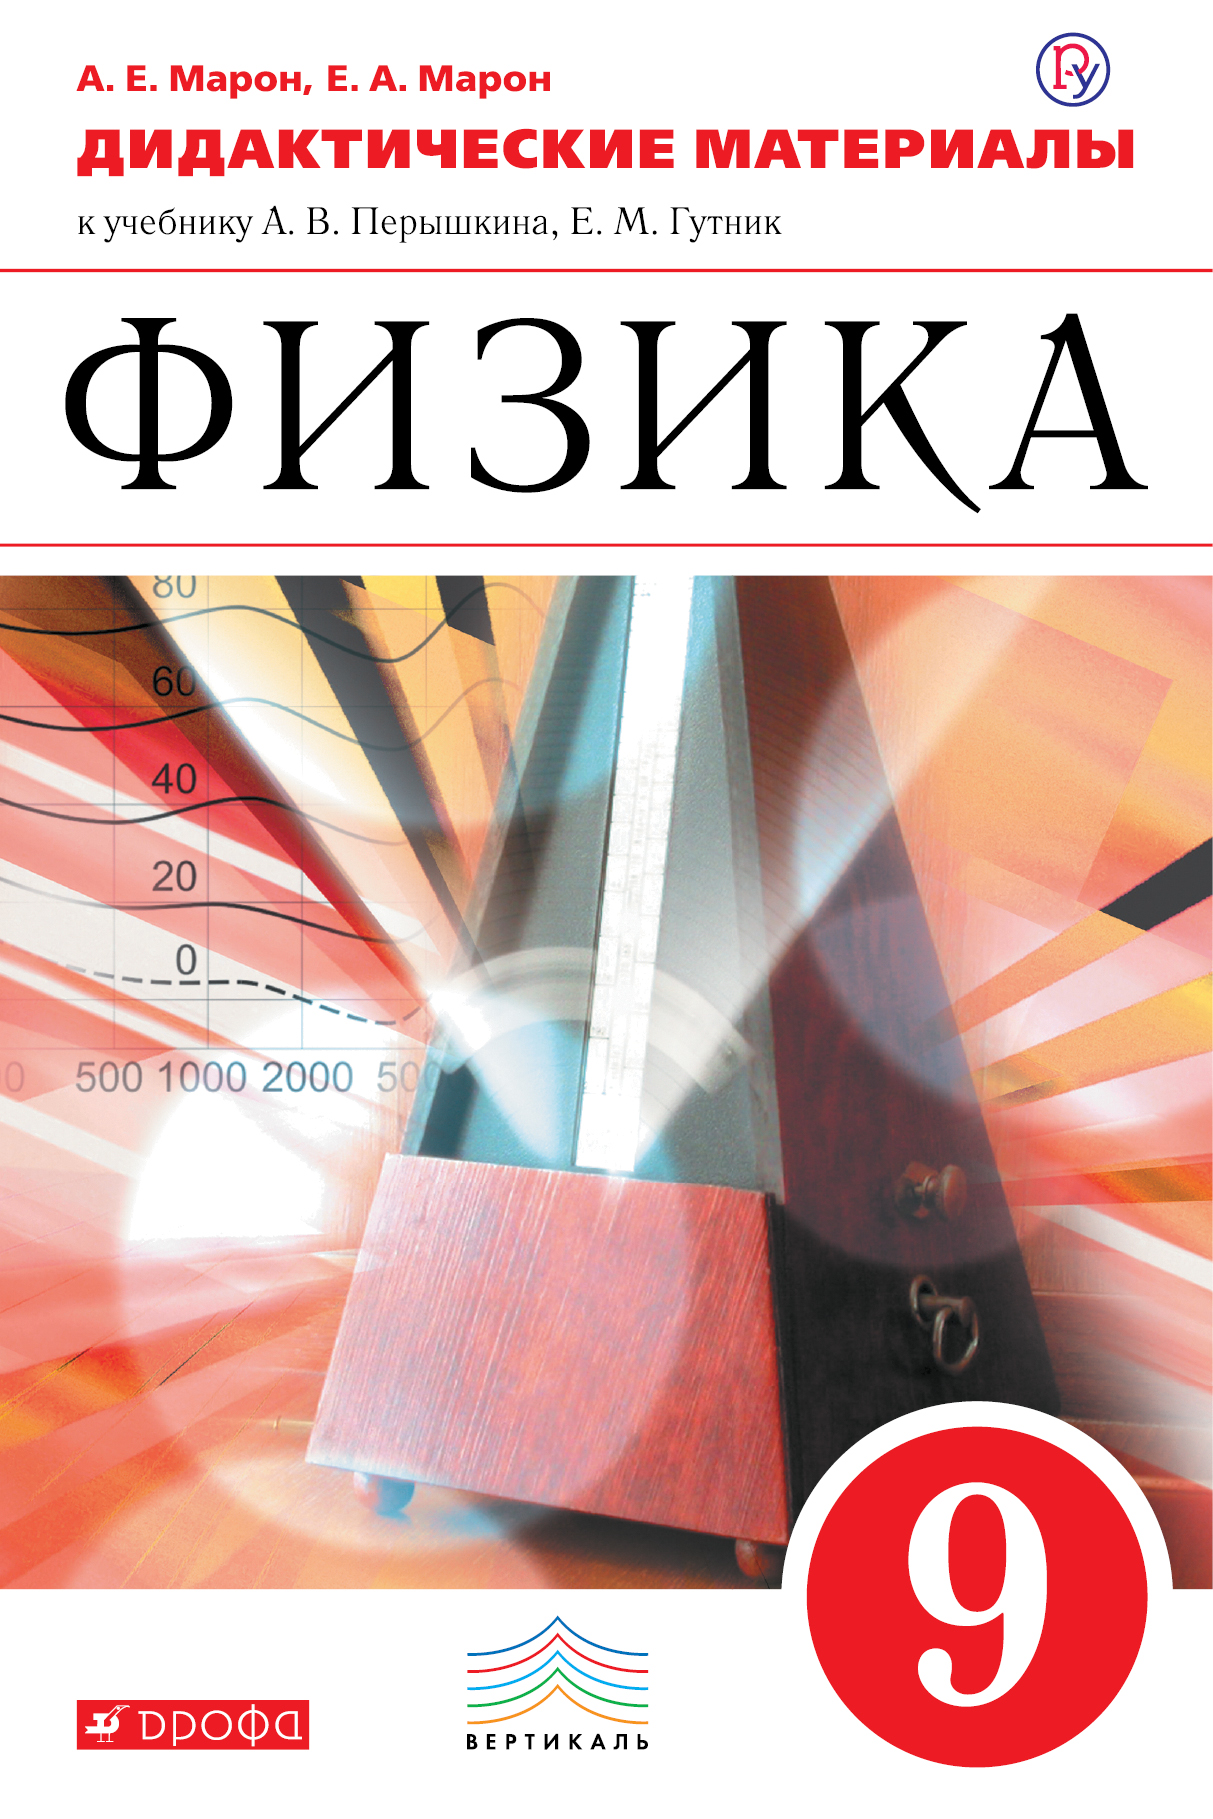 Марон А.Е., Марон Е.А. Физика. 9 класс. Дидактические материалы